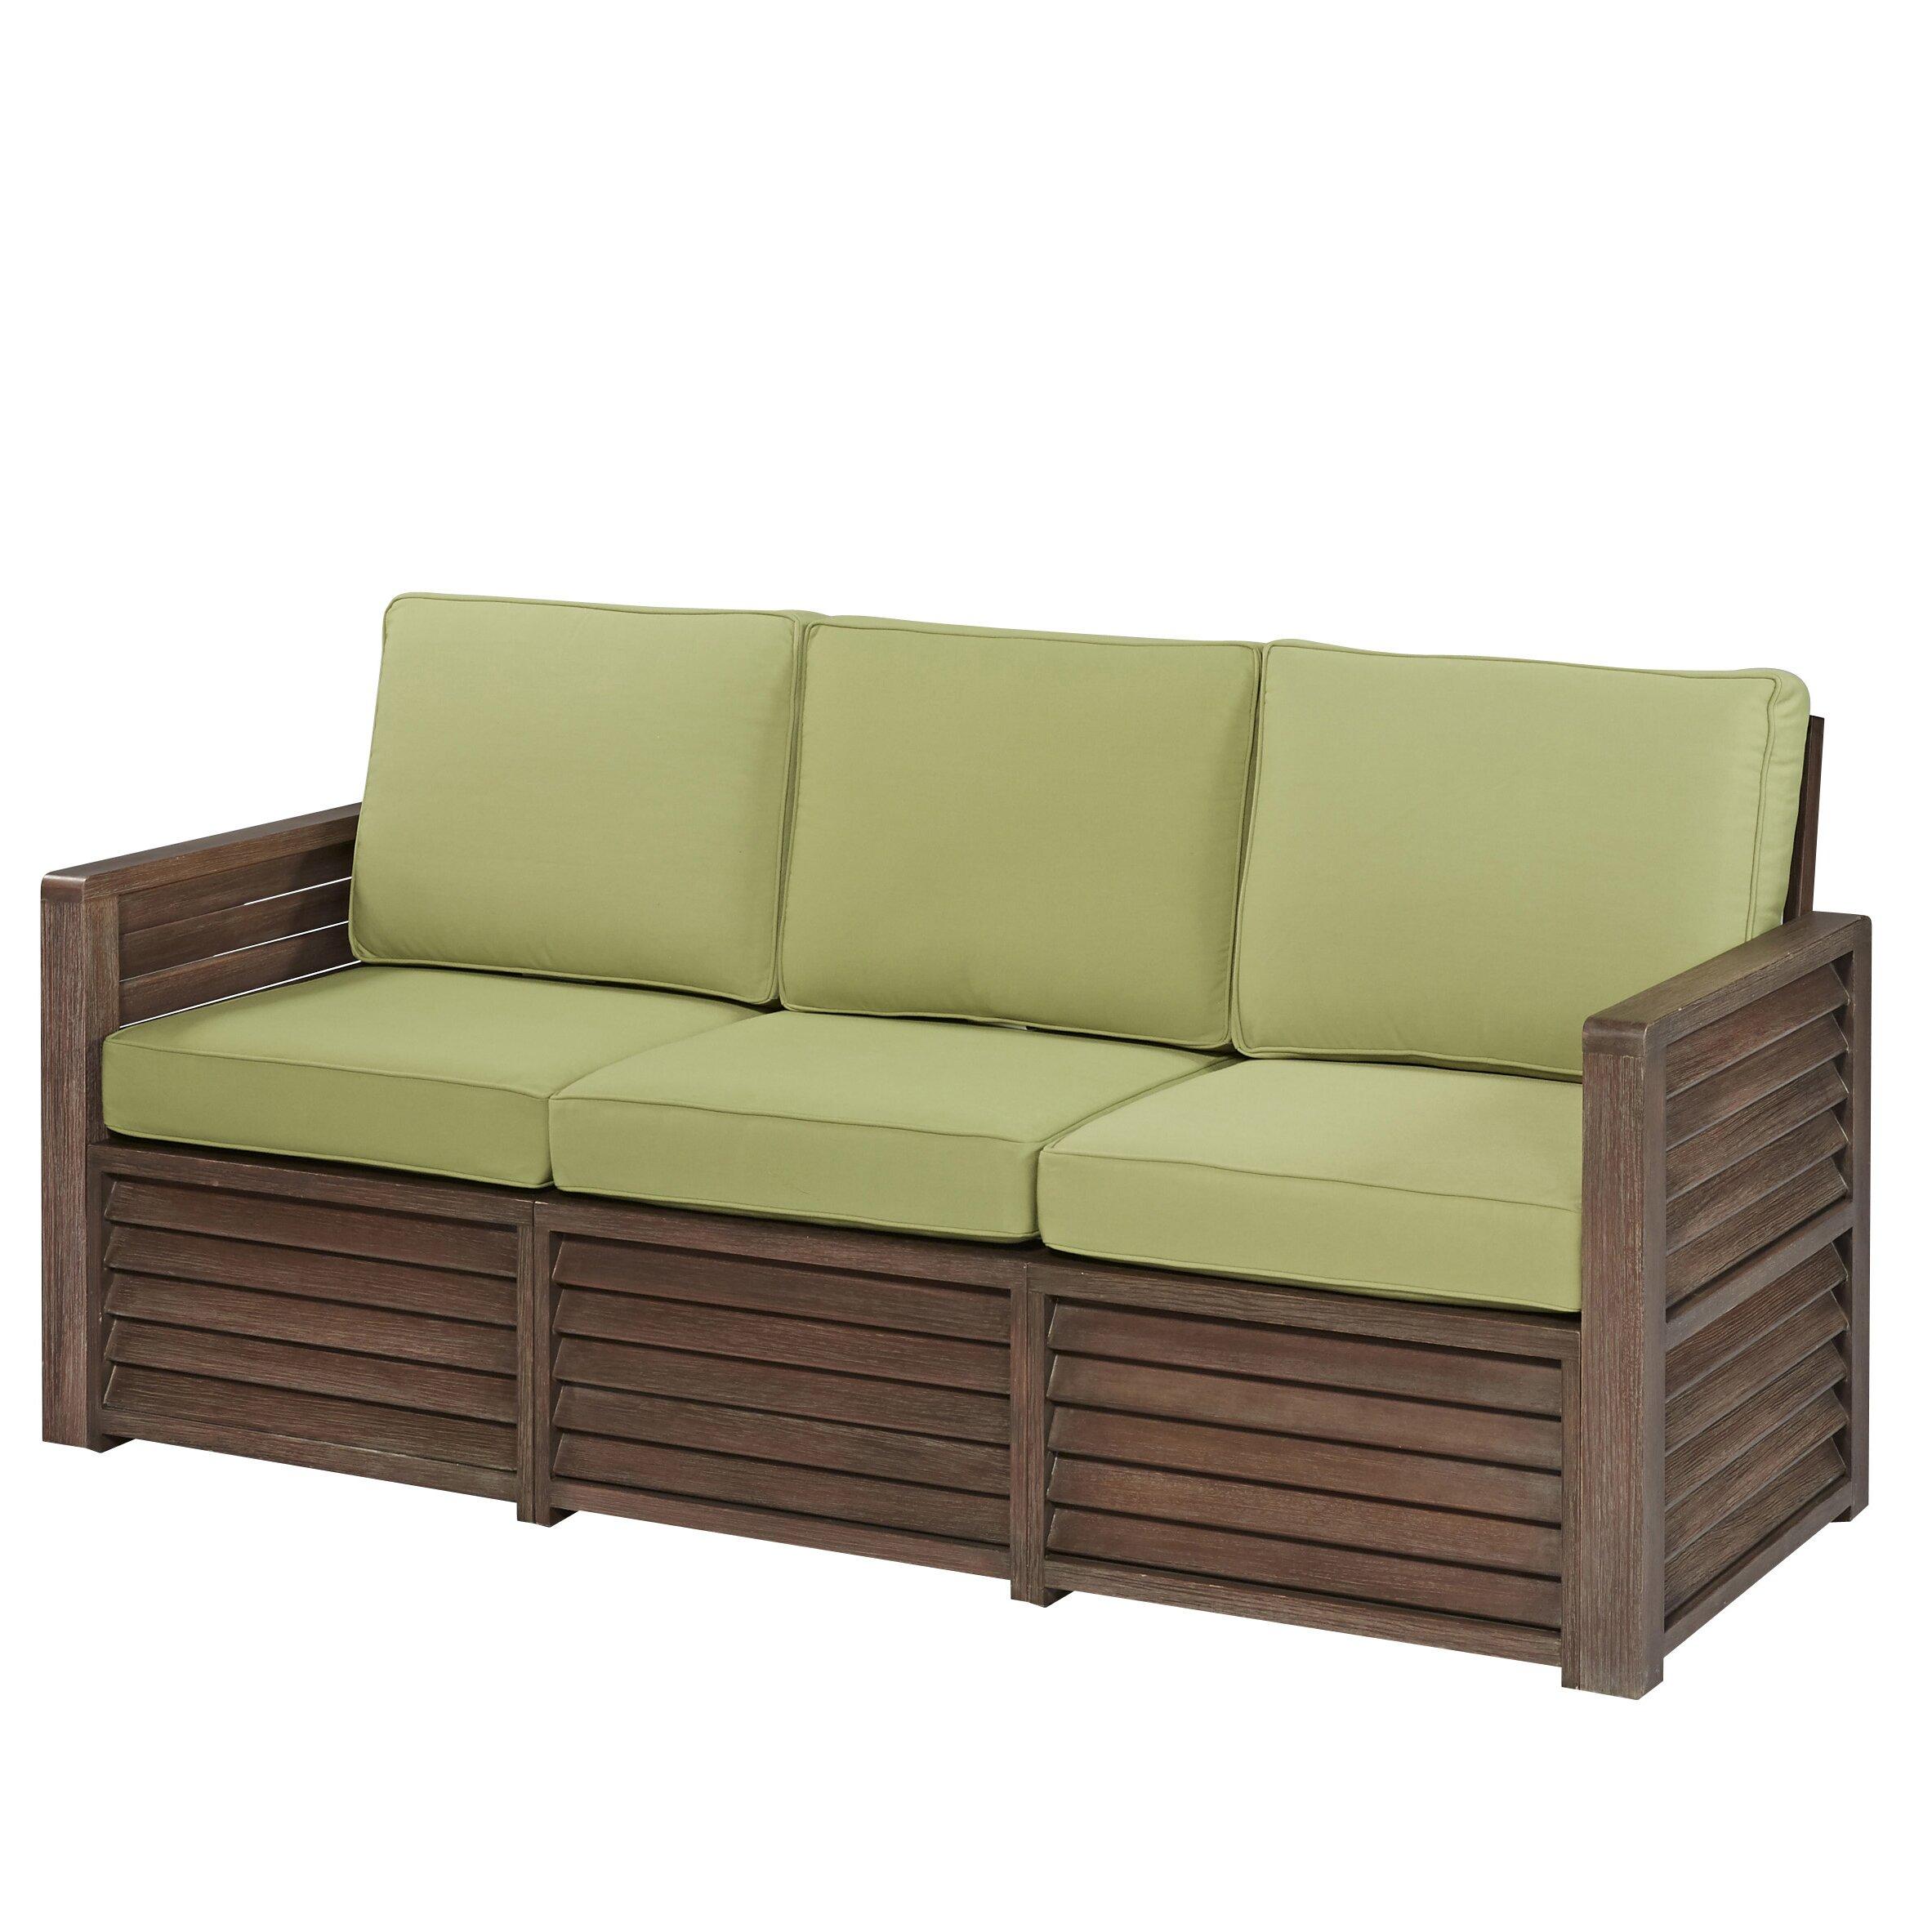 Home Styles Barnside Deep Seating Sofa With Cushions